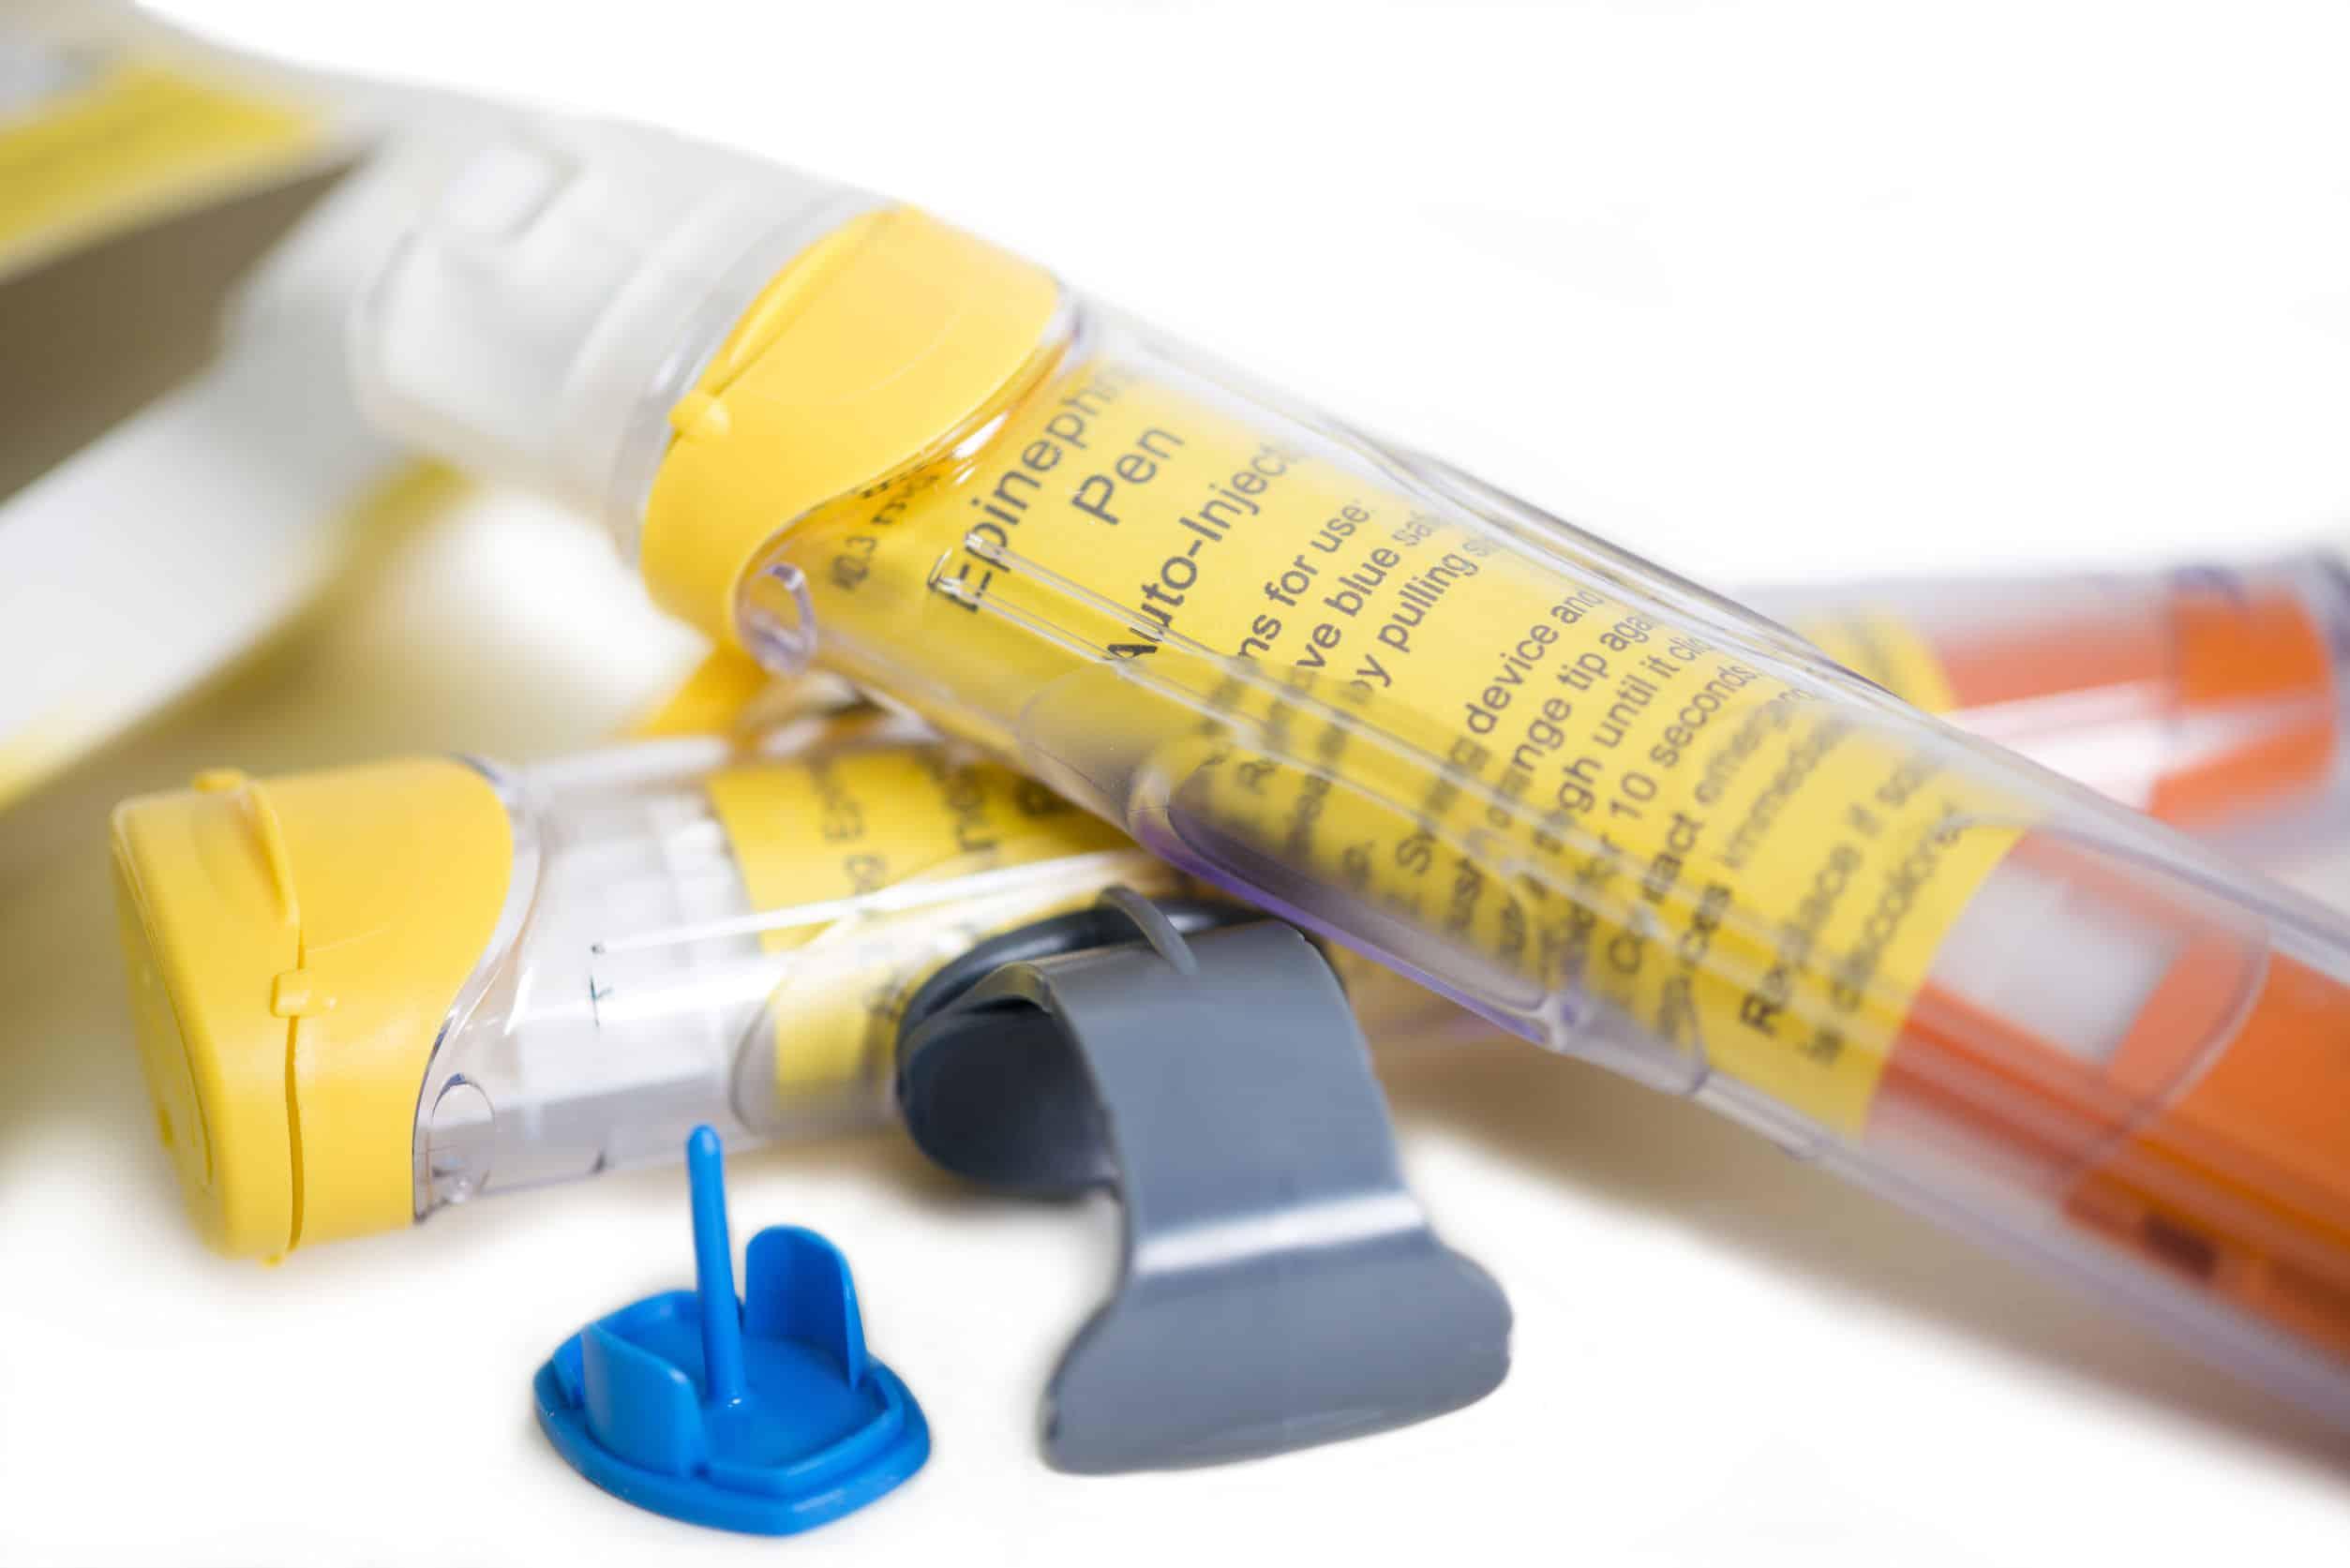 Michael Chamberlain prescription hope author